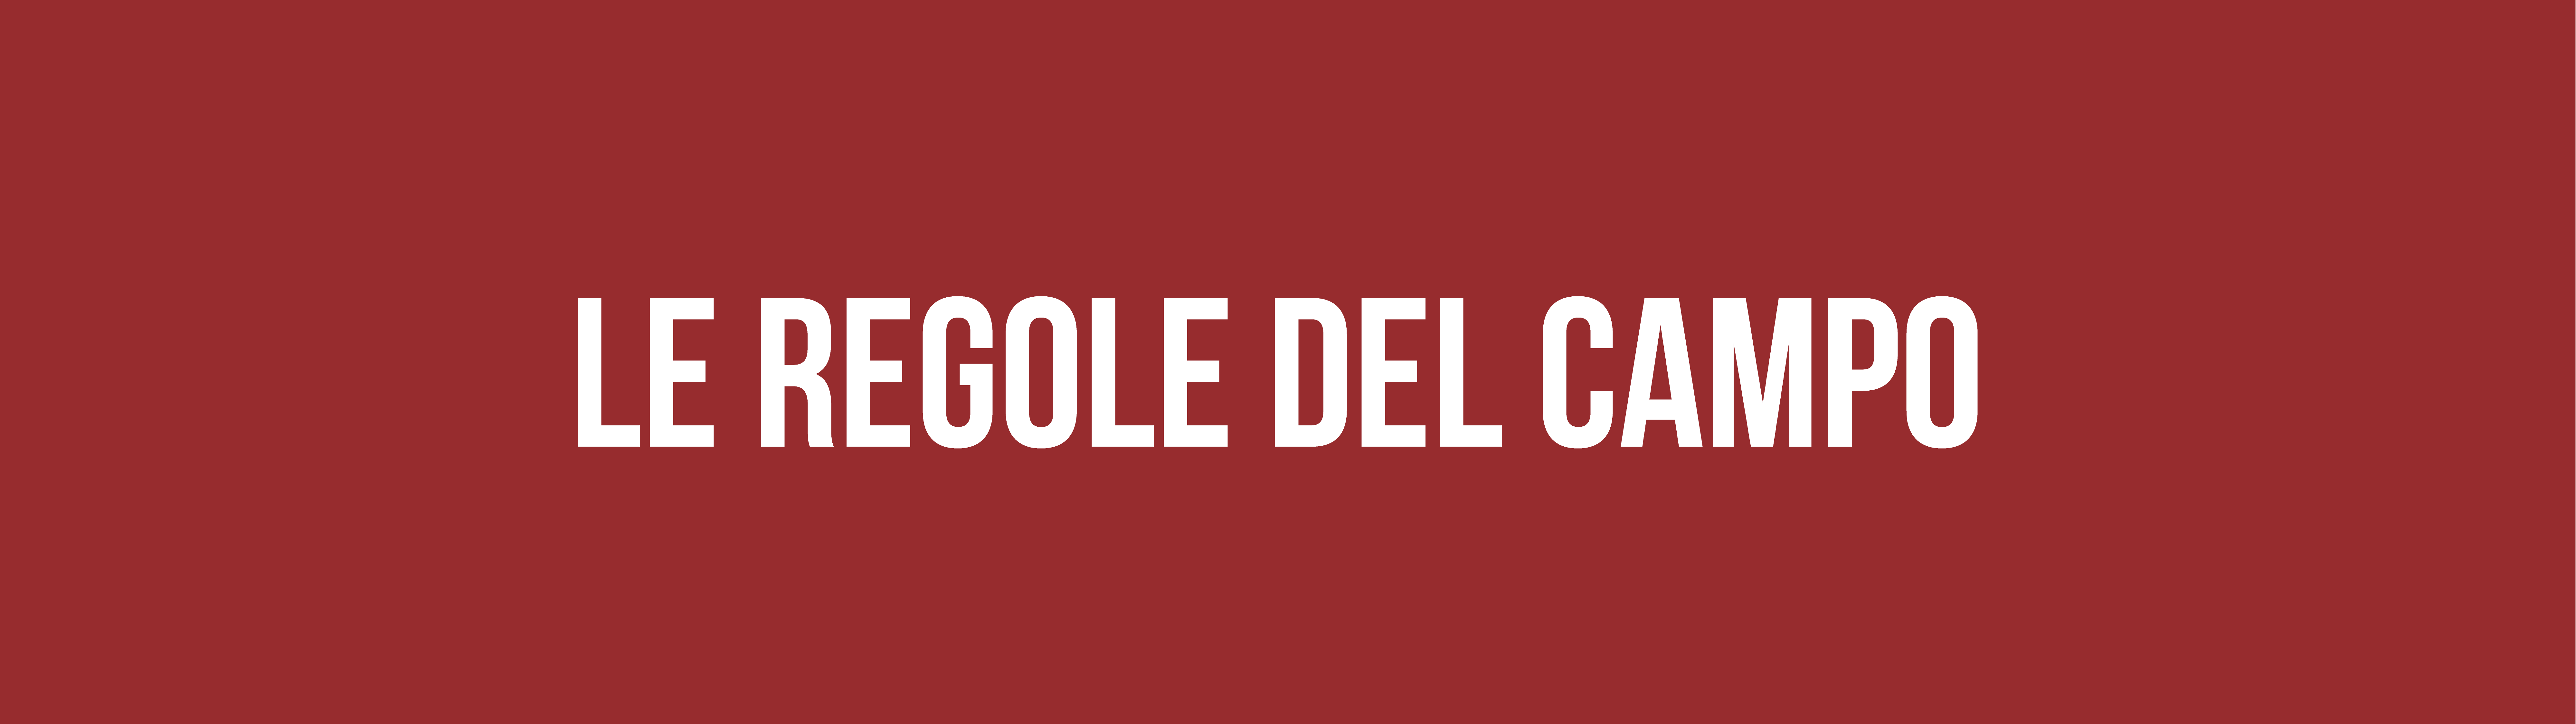 REGOLE_